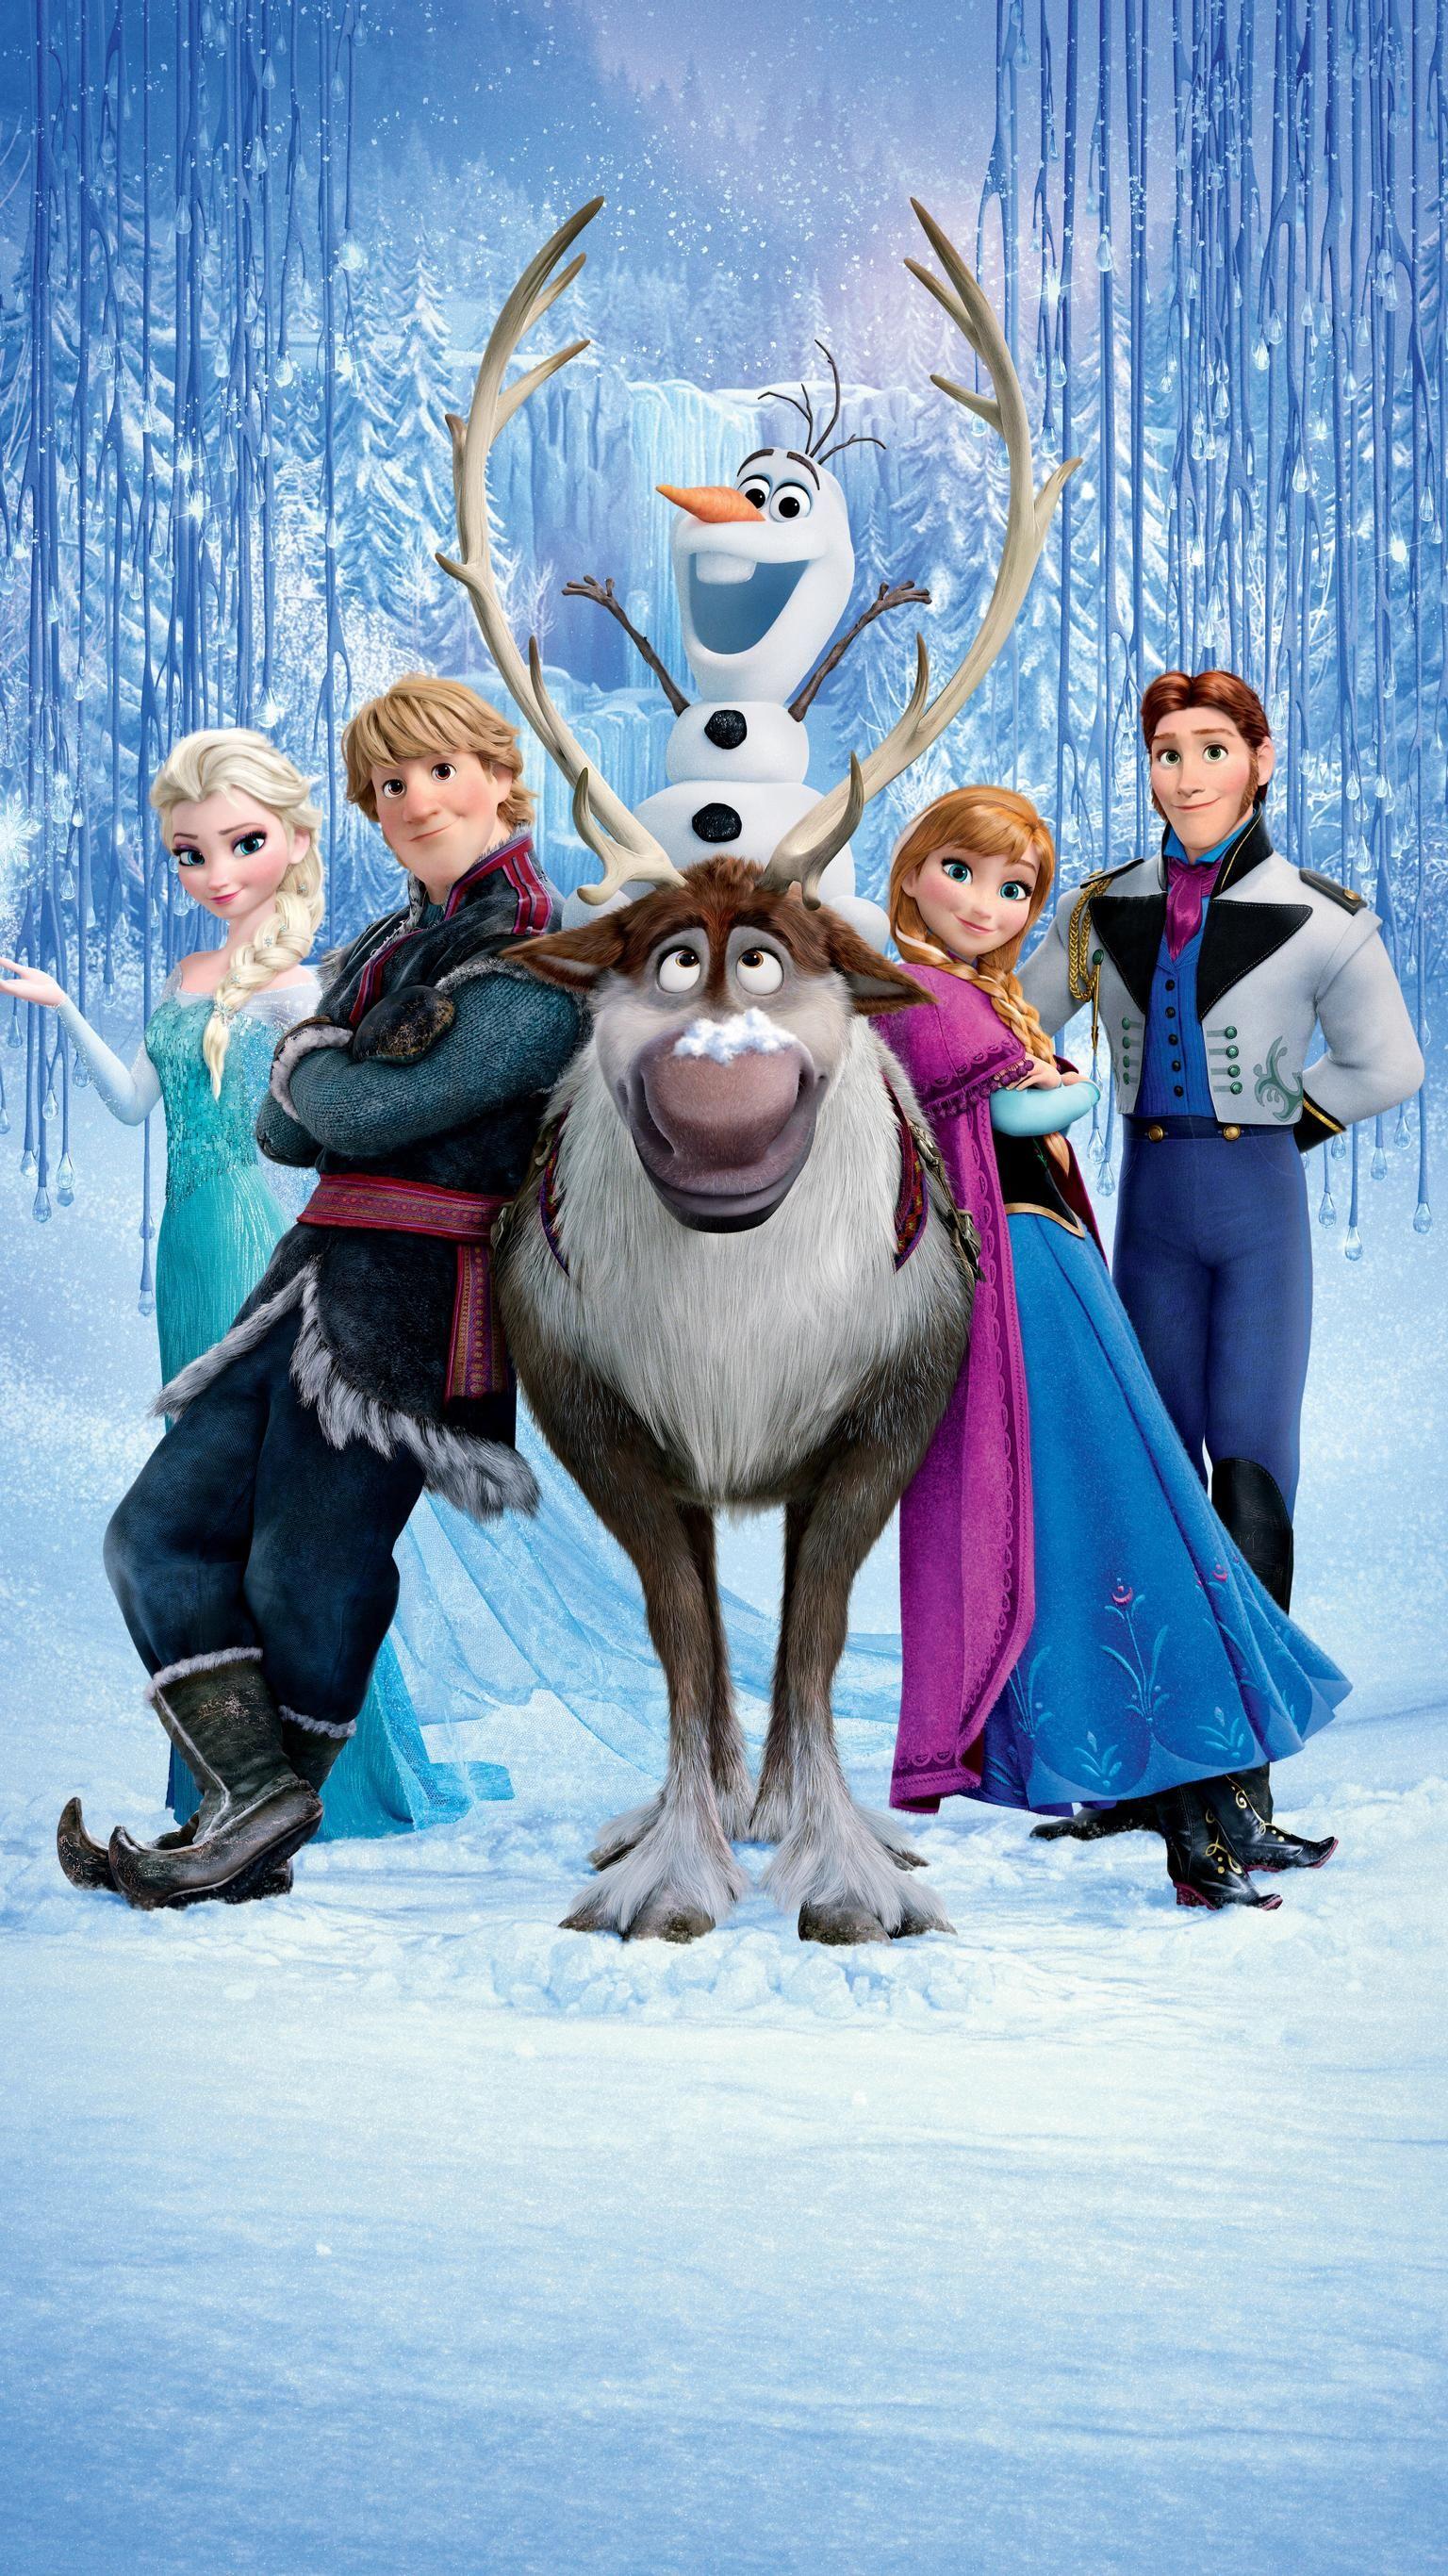 Frozen 2013 Phone Wallpaper Moviemania Frozen Poster Frozen Movie Disney Frozen